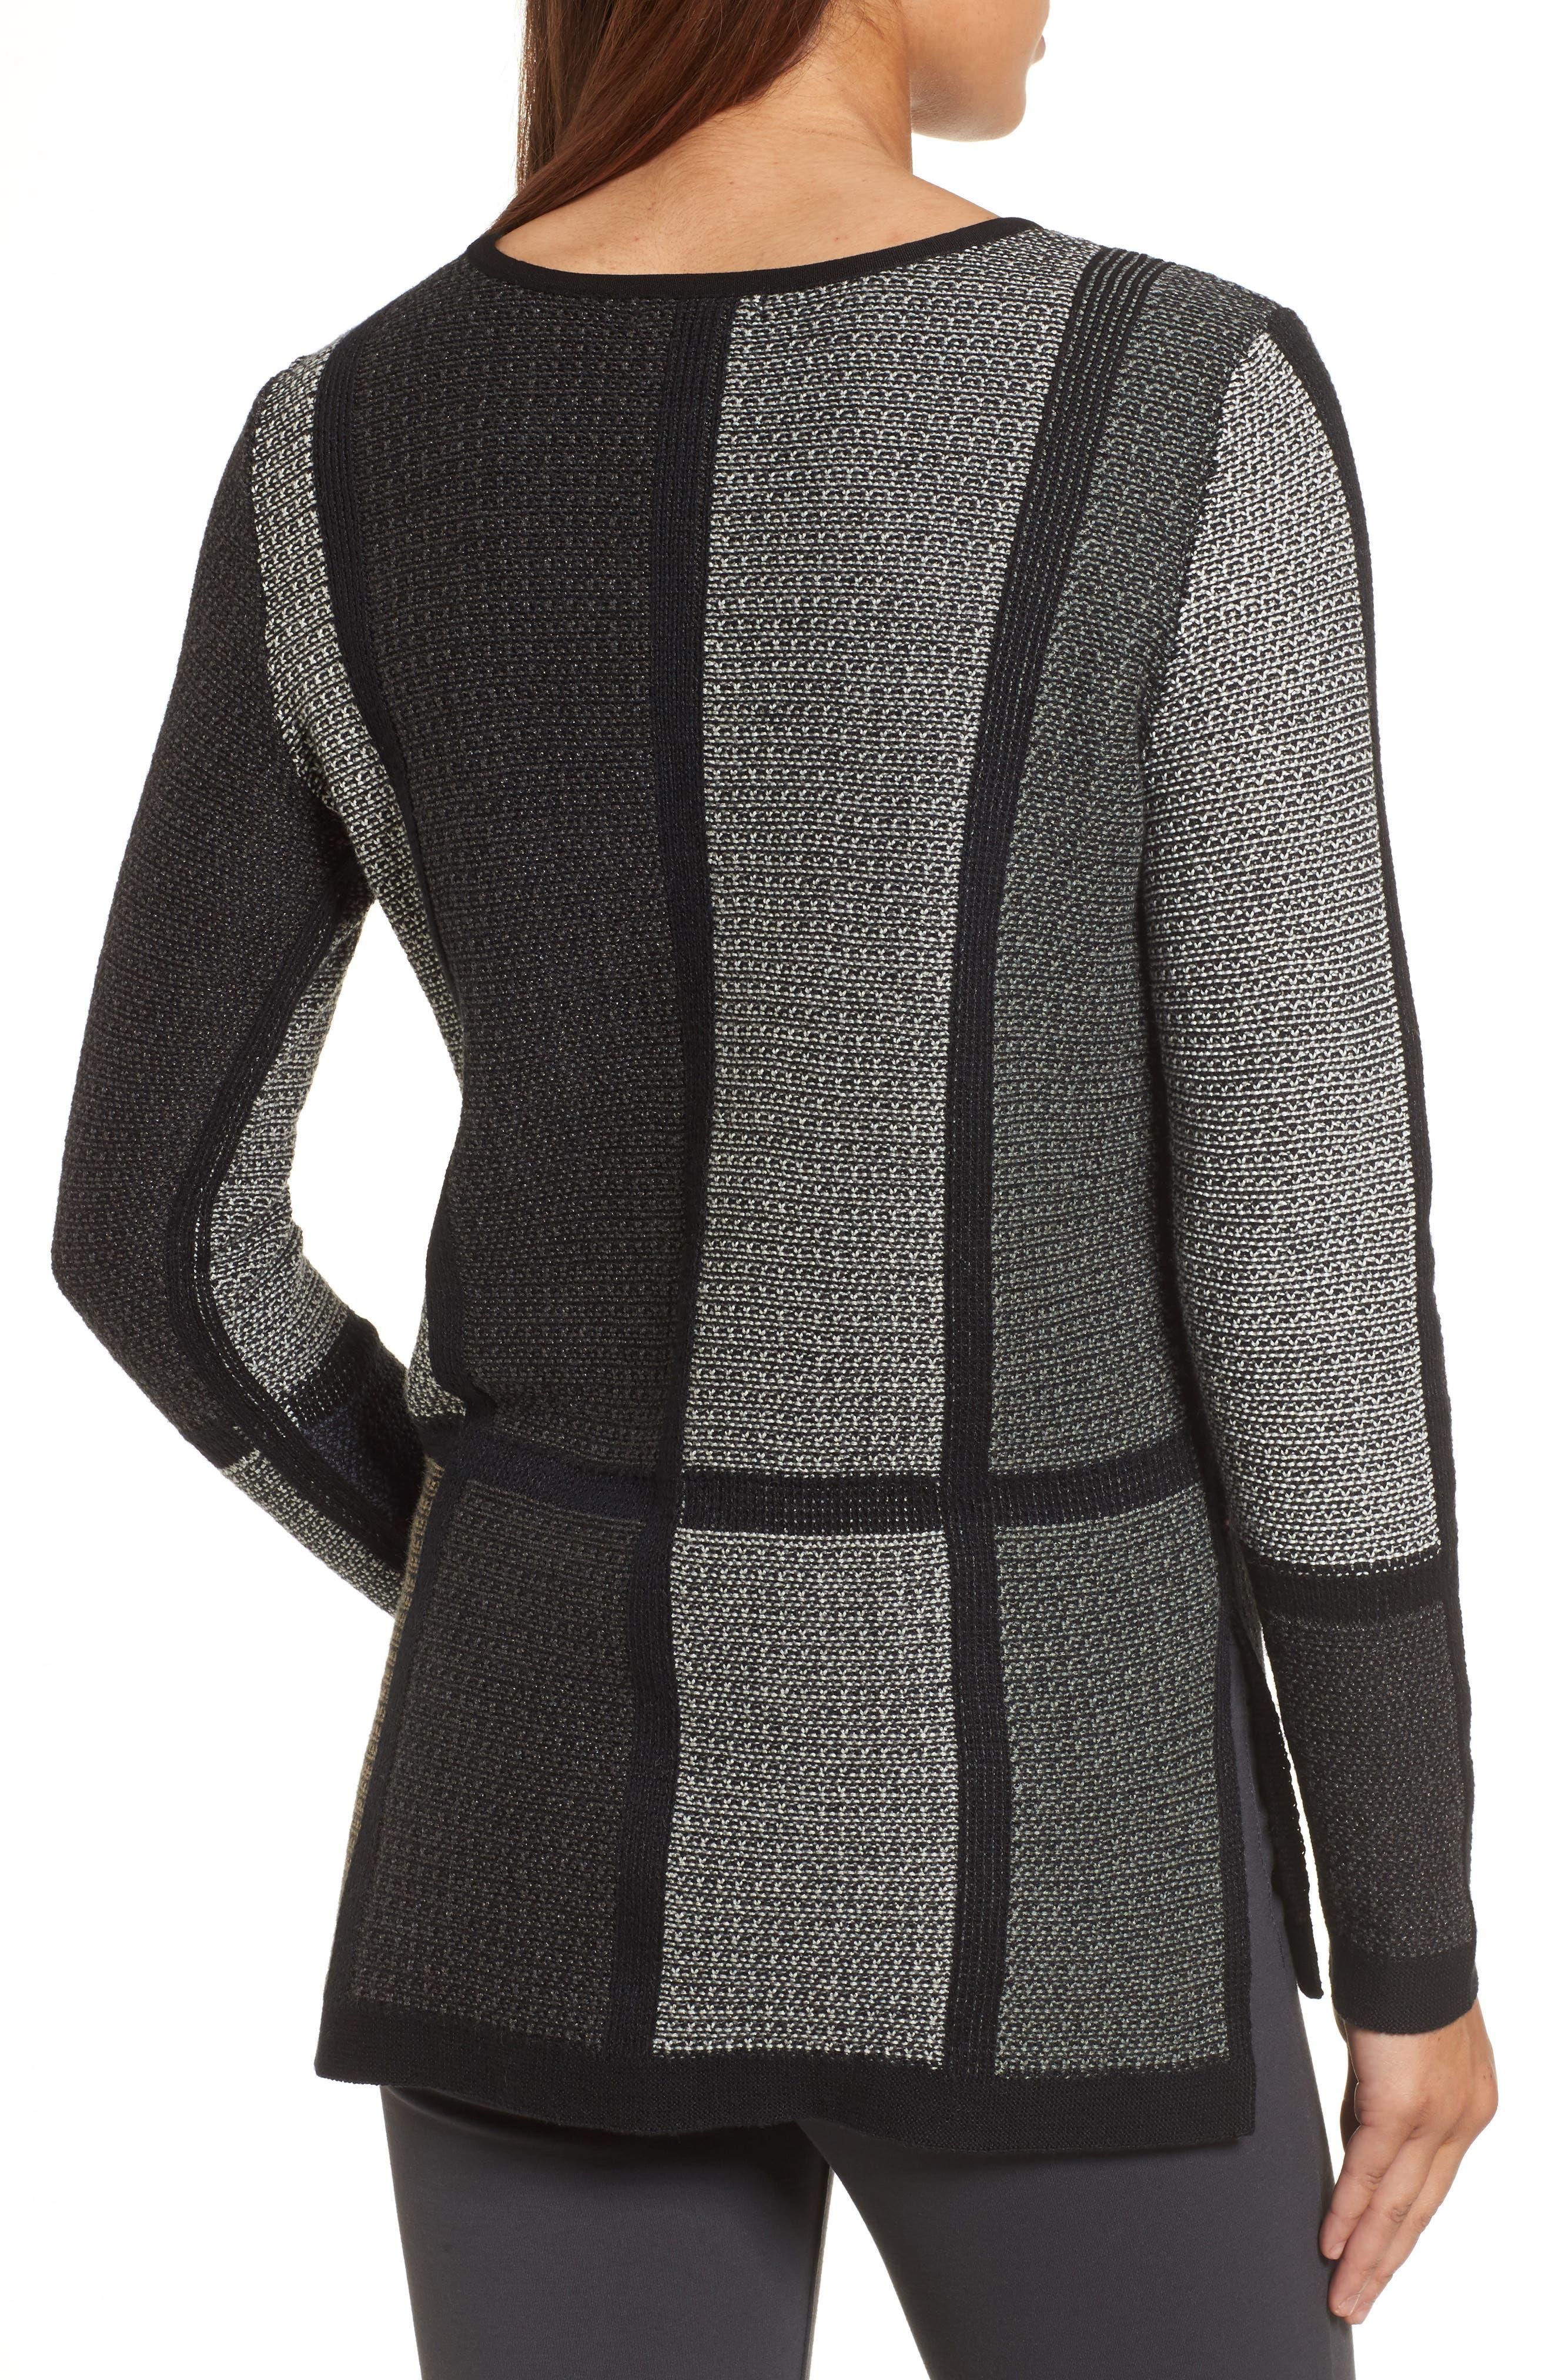 Alternate Image 2  - NIC+ZOE Around the Block Sweater (Regular & Petite)